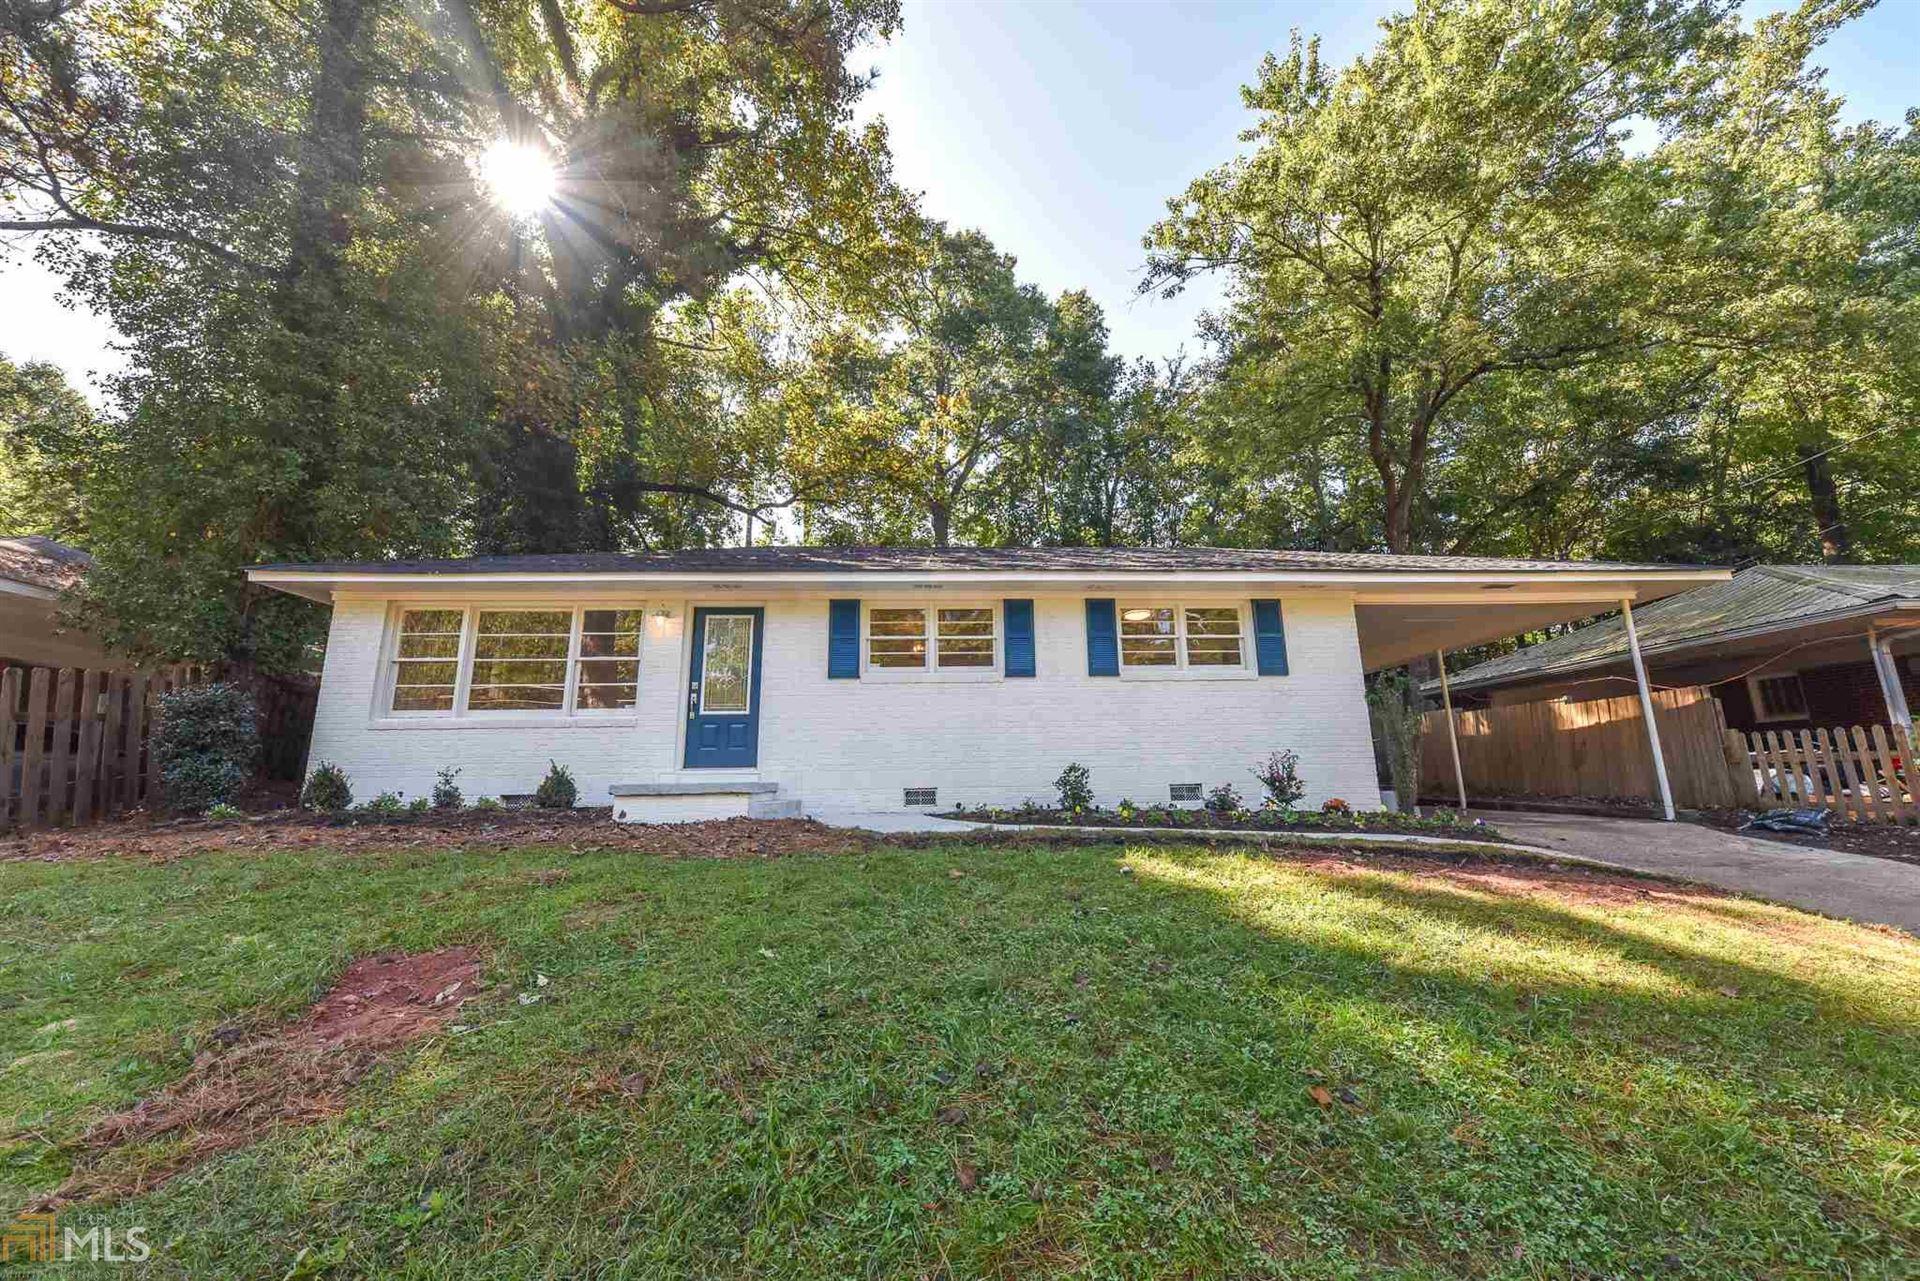 542 Woodland Hills Dr, Athens, GA 30606 - MLS#: 8884505